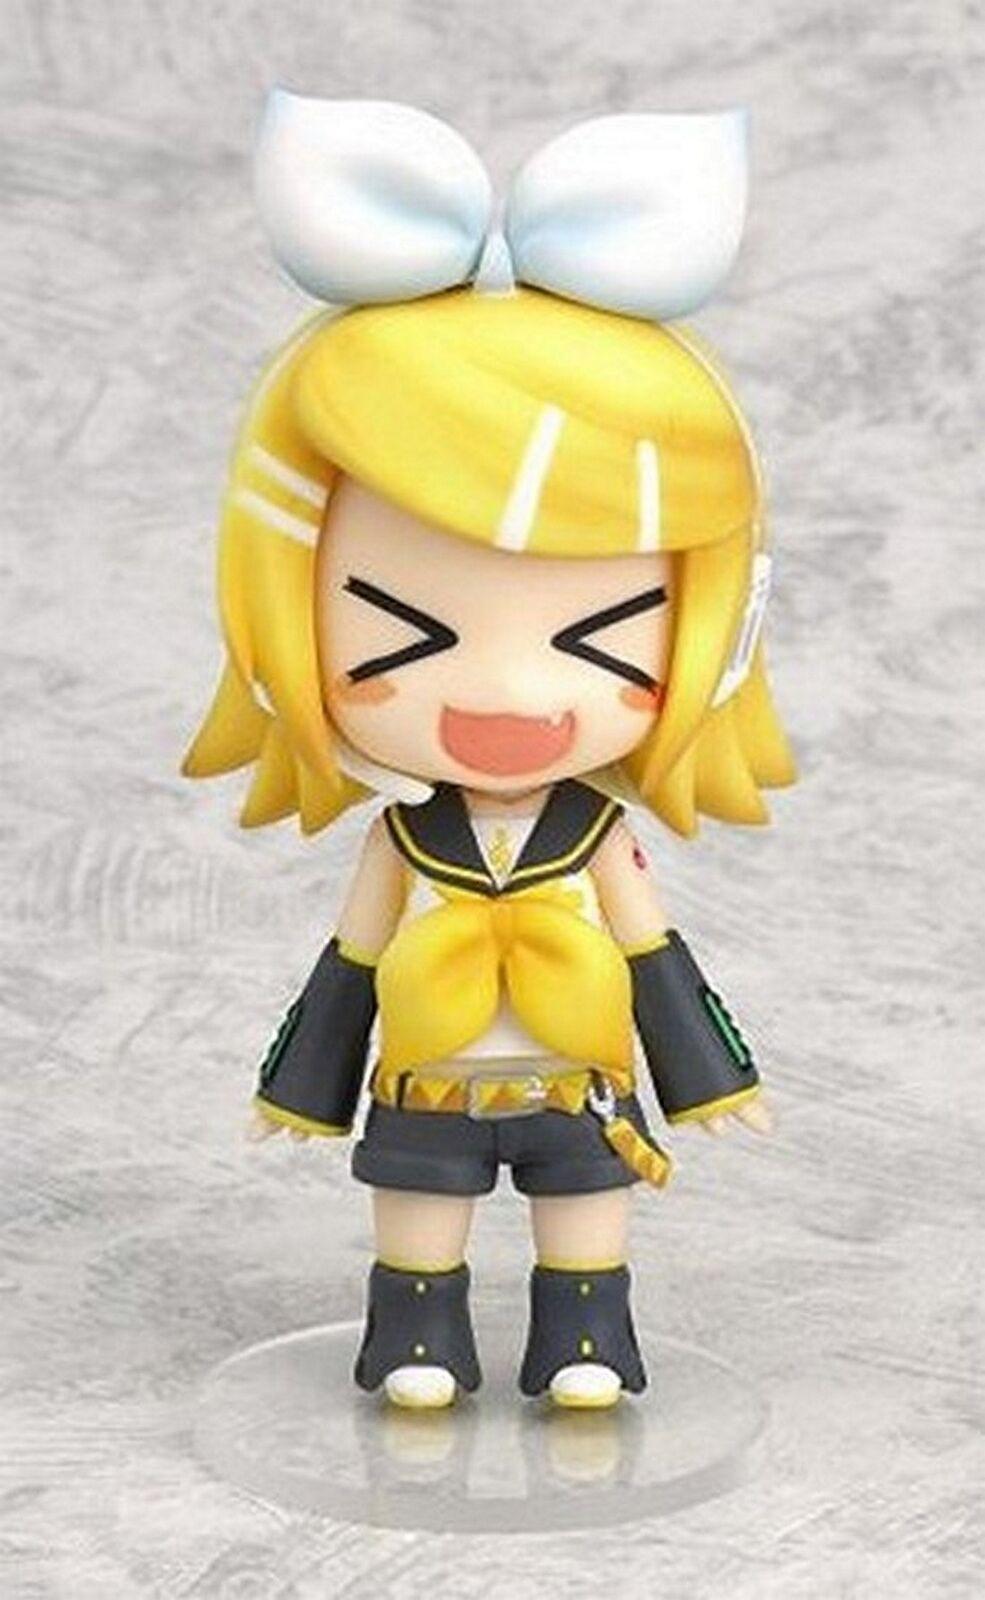 Good Smile Vocaloid  Kagamine Rin Nendgoldid Nendgoldid Nendgoldid Action Figure 82aa7d